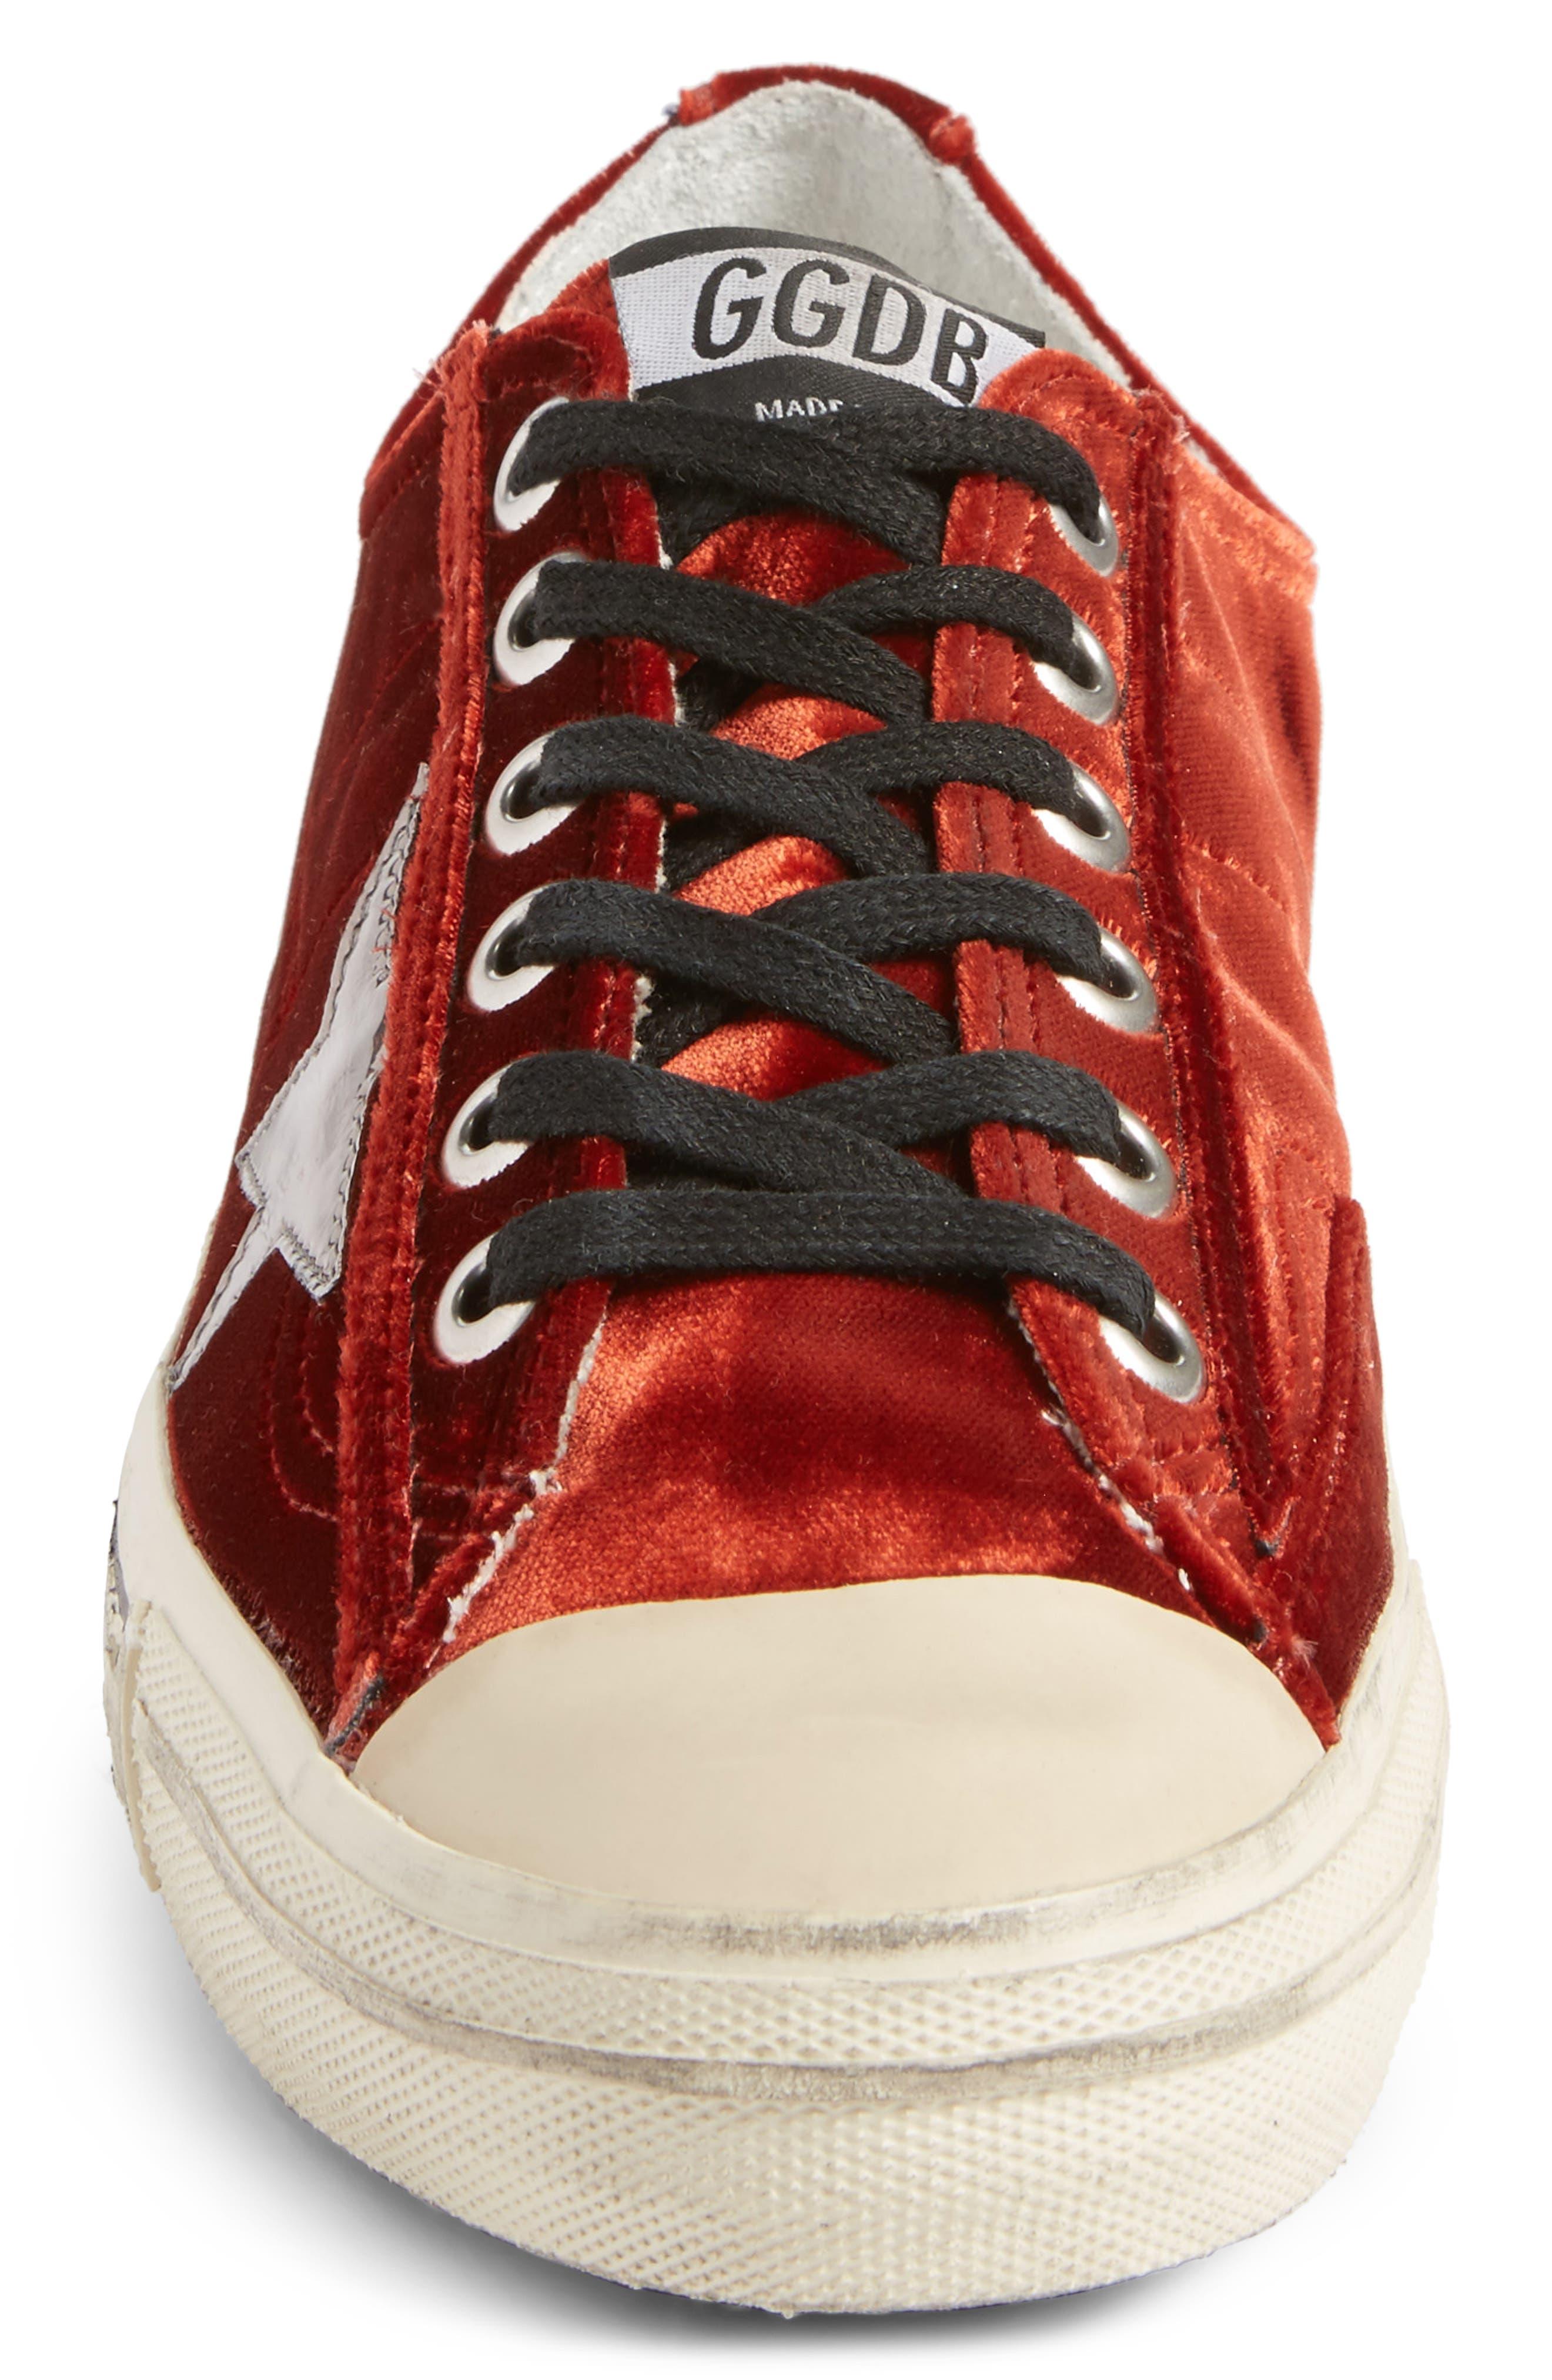 V-Star 2 Low Top Sneaker,                             Alternate thumbnail 4, color,                             930